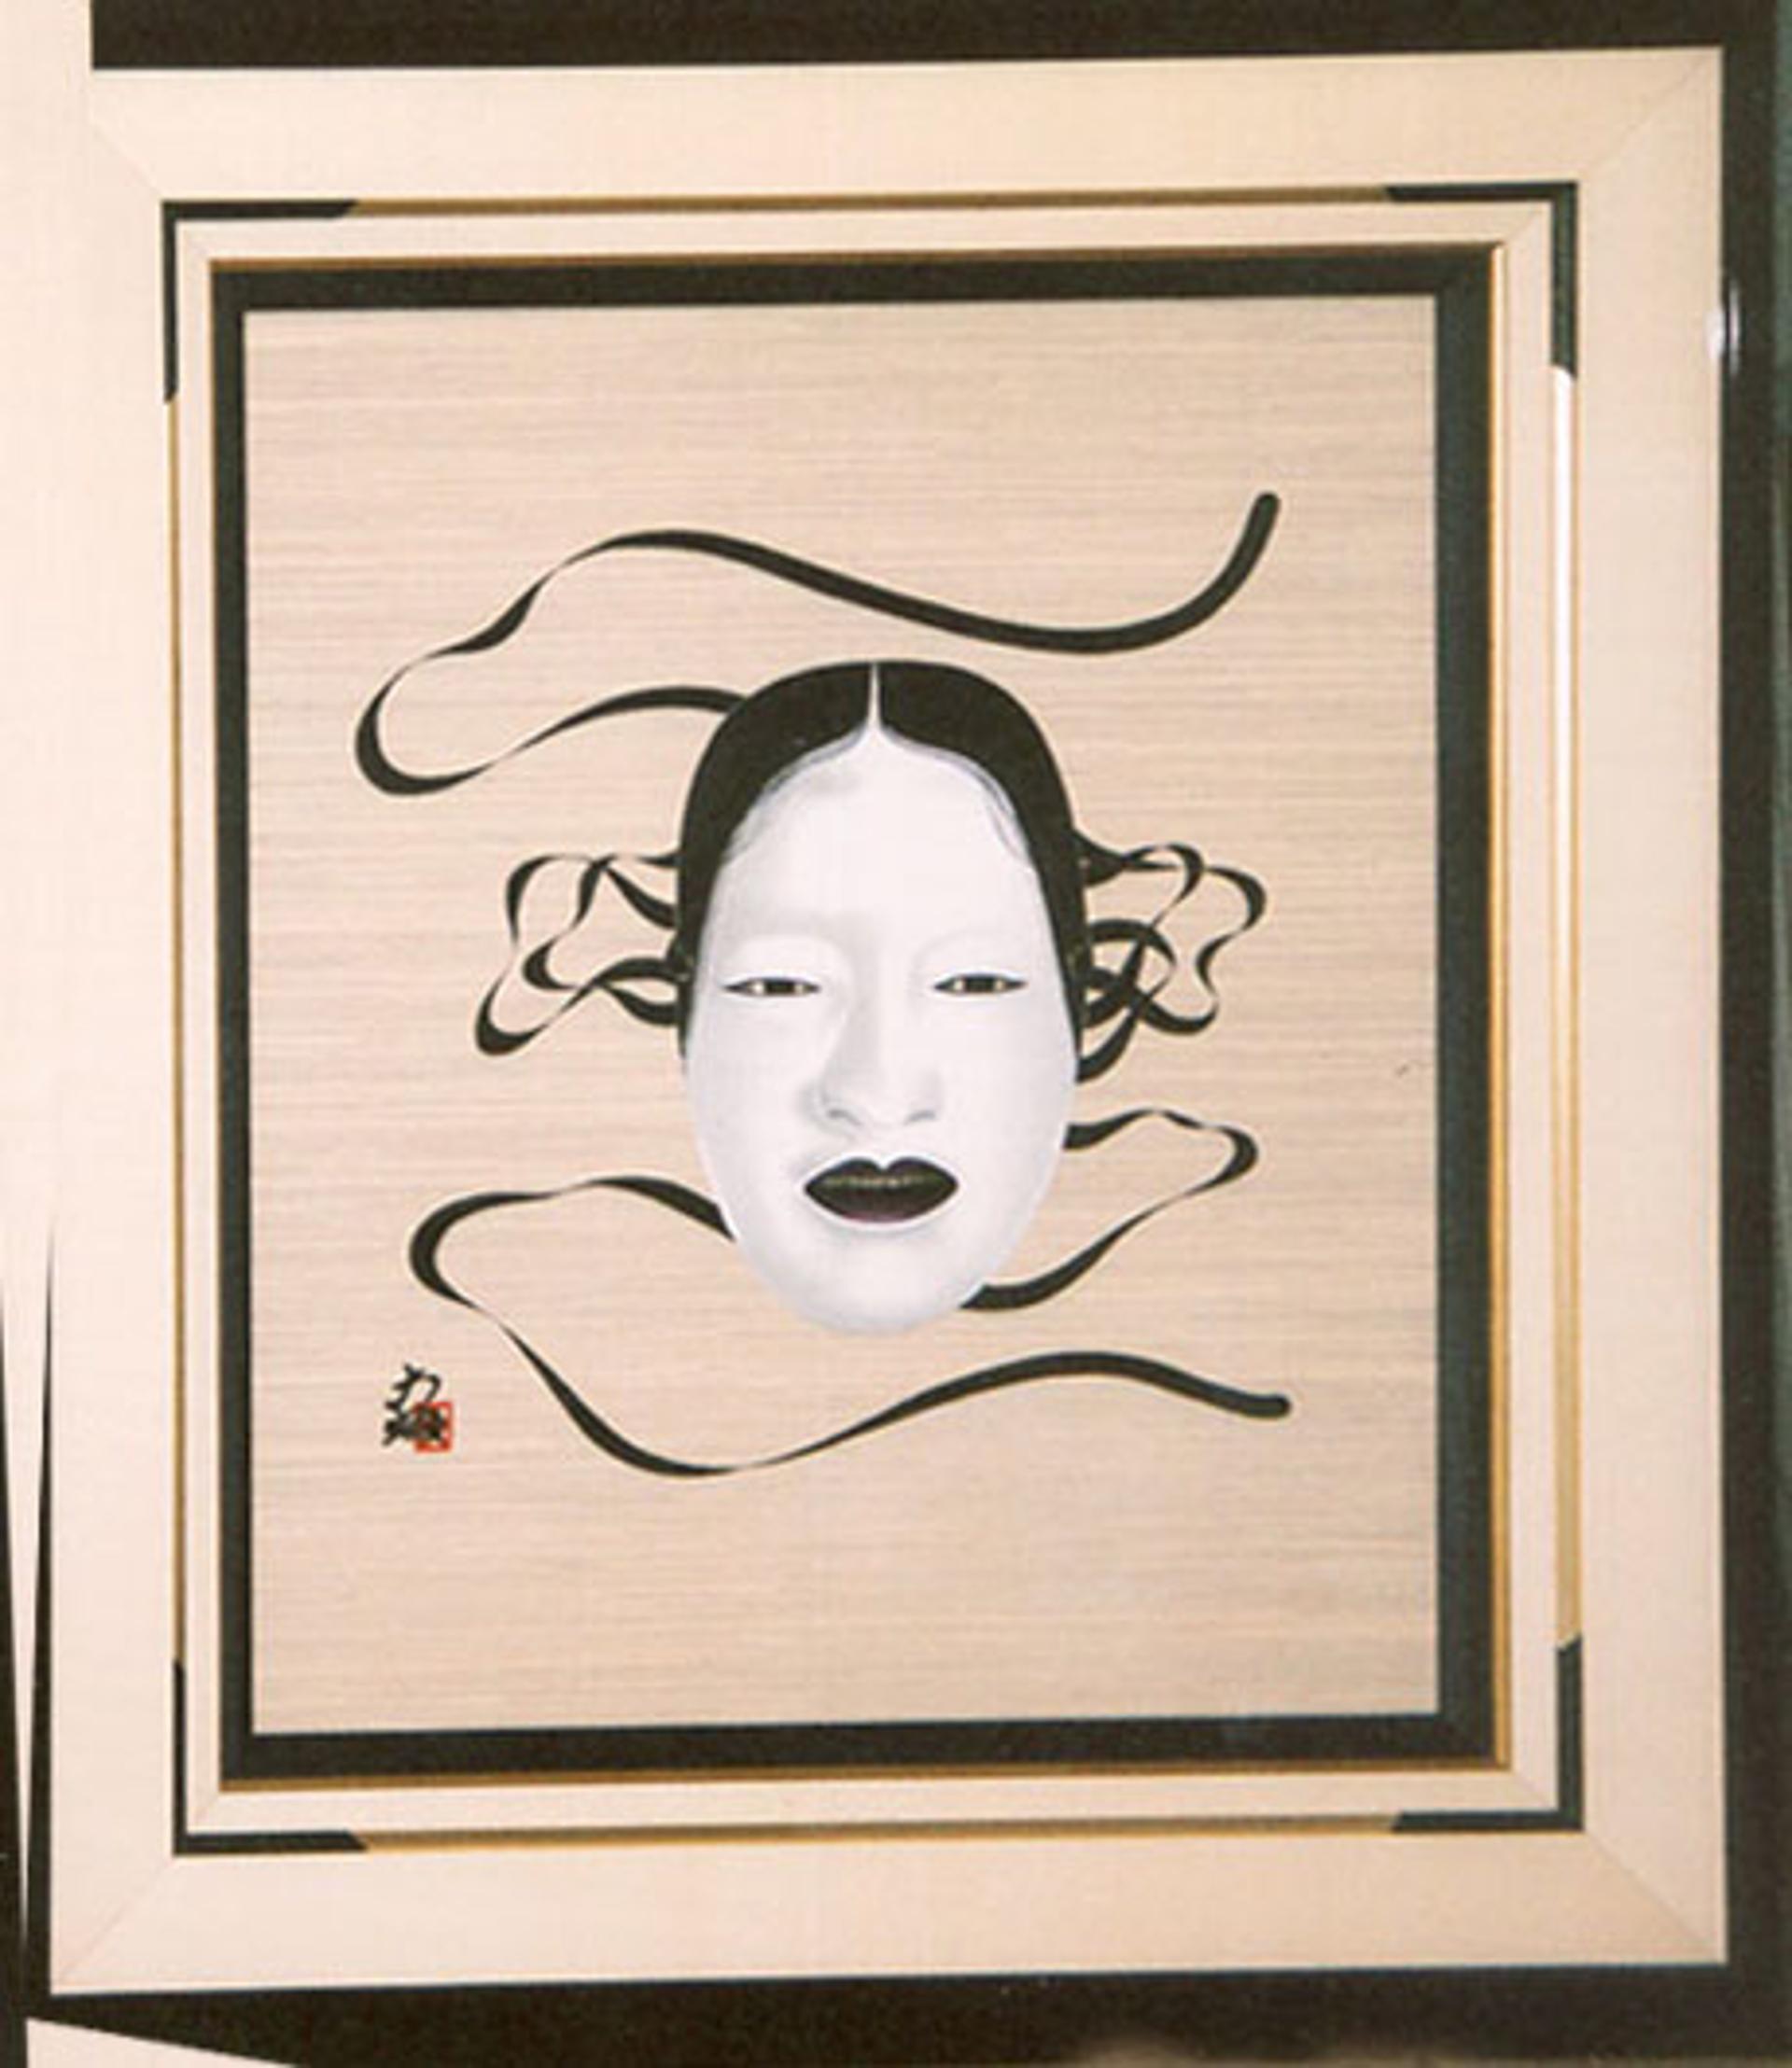 Noh Mask by Hisashi Otsuka